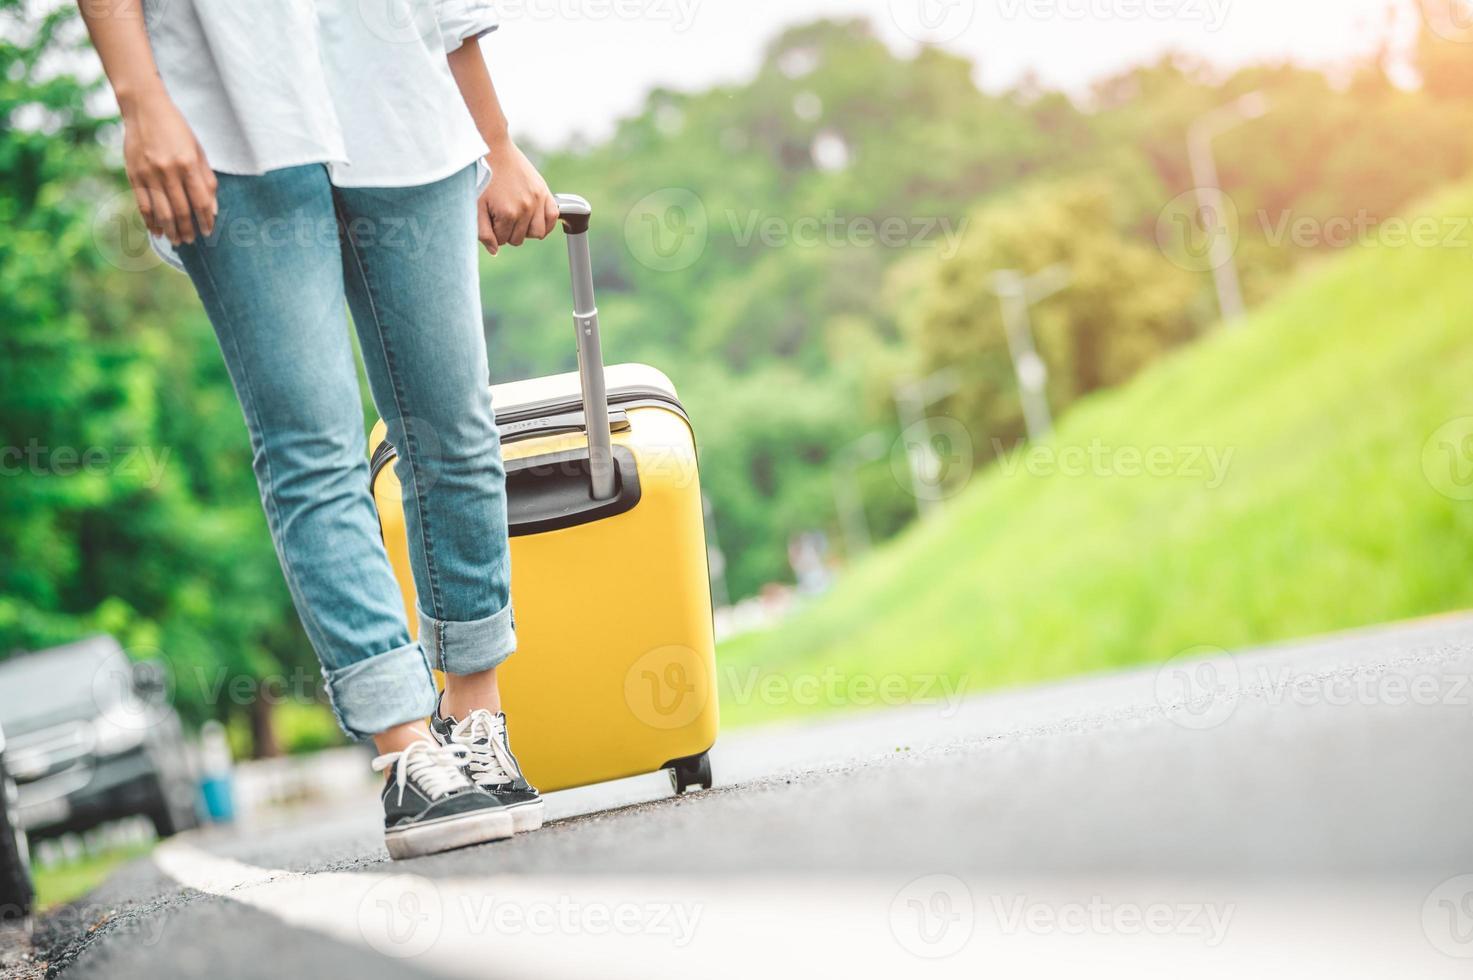 Closeup lower body of woman handling yellow trolly luggage along road photo